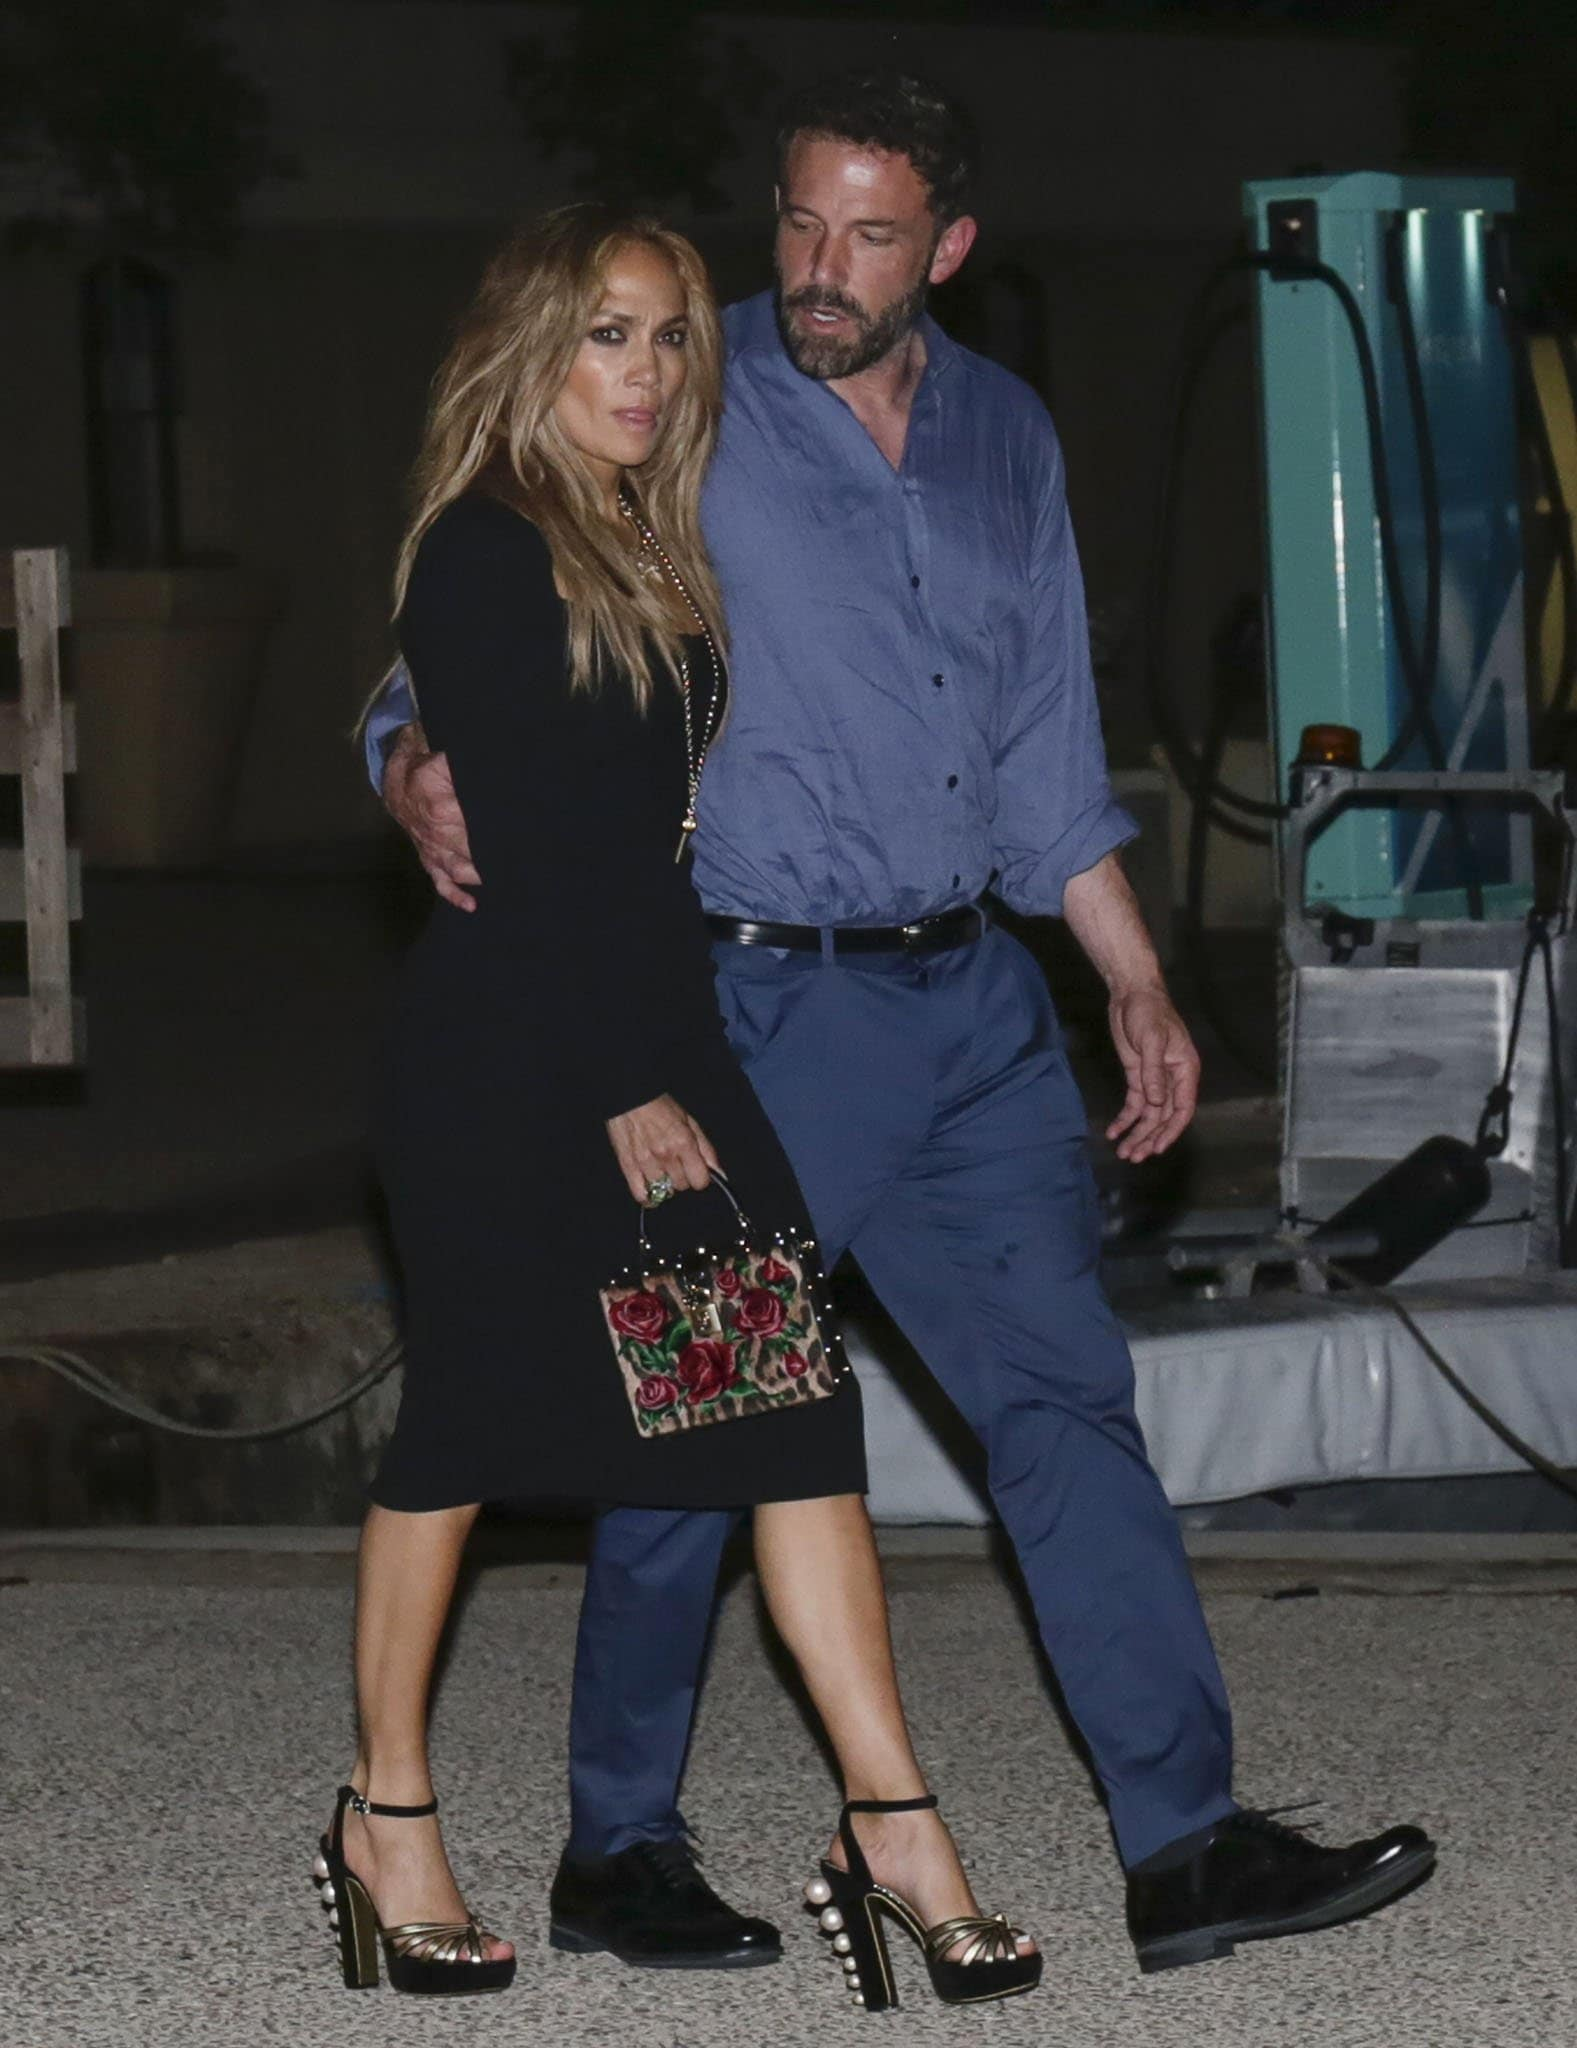 Jennifer Lopez shows off her svelte figure in Dolce & Gabbana LBD